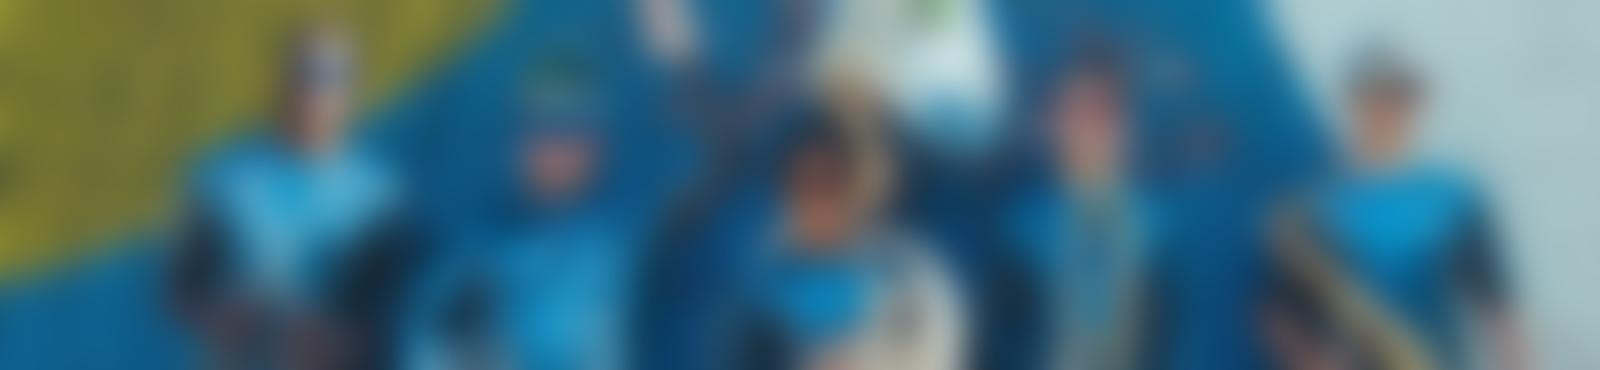 Blurred 3cf7c4eb f549 421d 9cad 4aa101b603ce